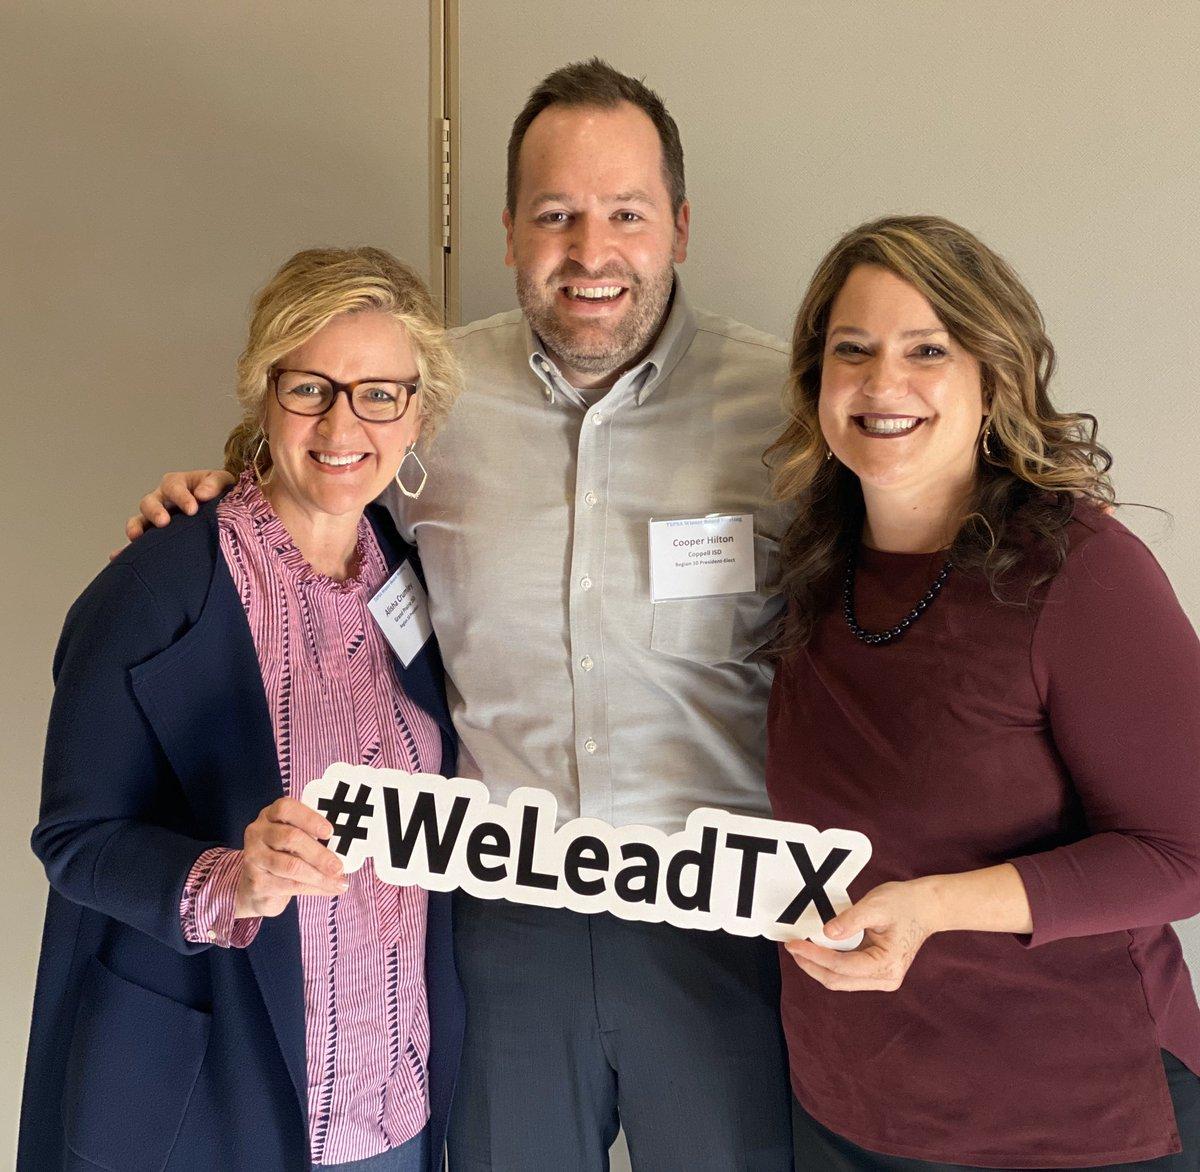 TEPSA Winter Board Meeting #weleadtx @AmandaSchmitter #tepsanoftheyearregion10 @HiltonCooper @tepsamark